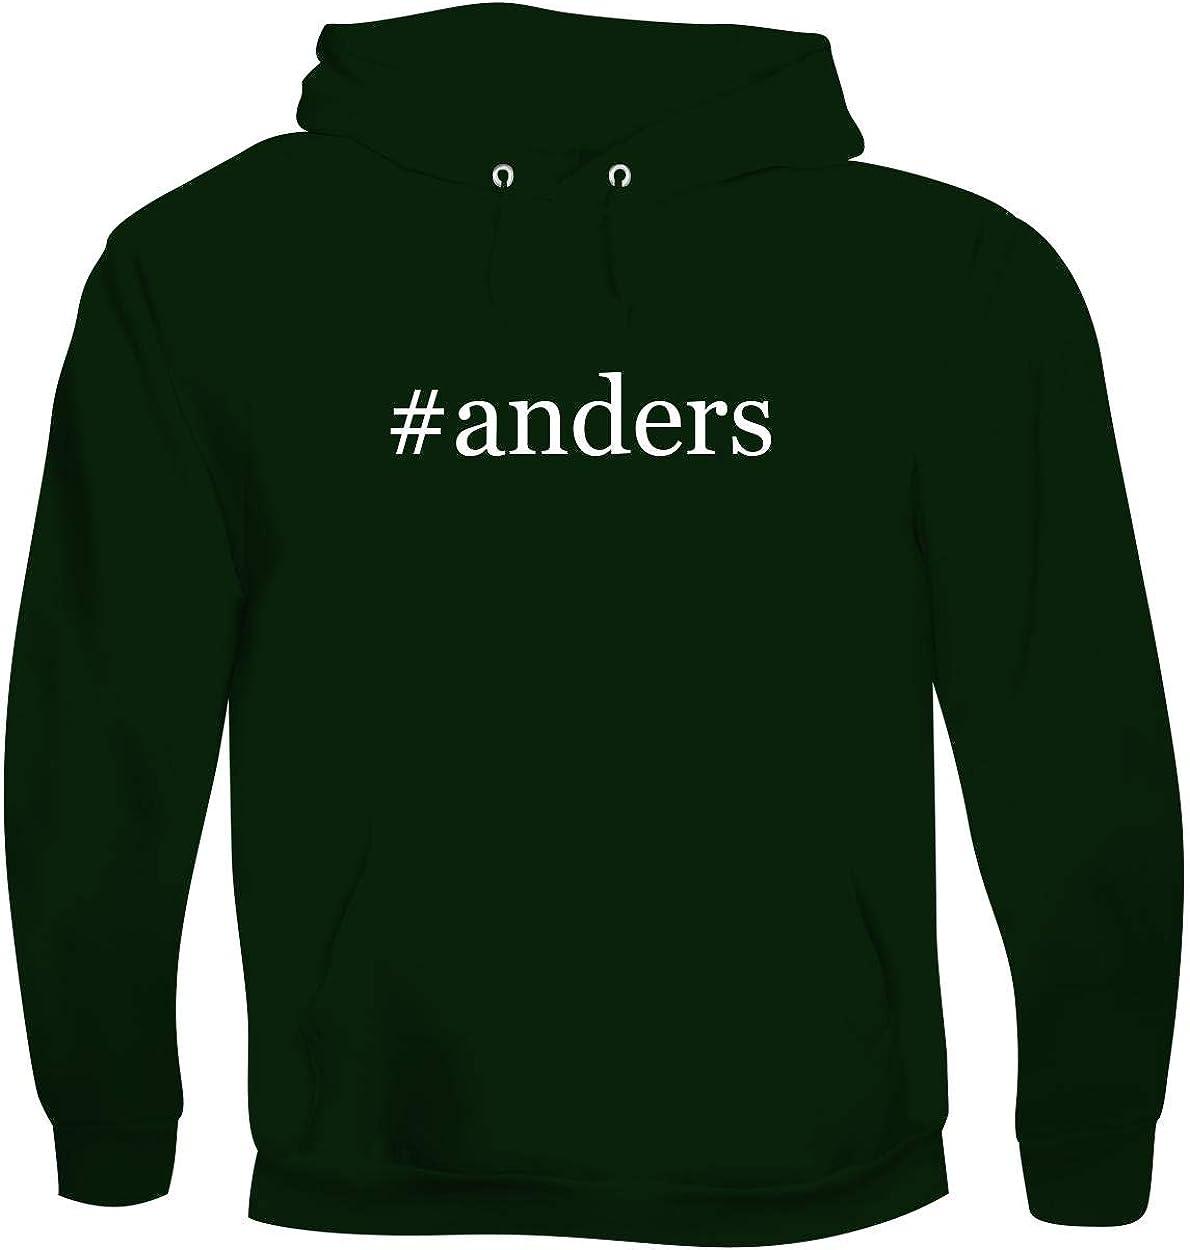 #anders - Men's Hashtag Soft & Comfortable Hoodie Sweatshirt Pullover 516Nun6-VsL